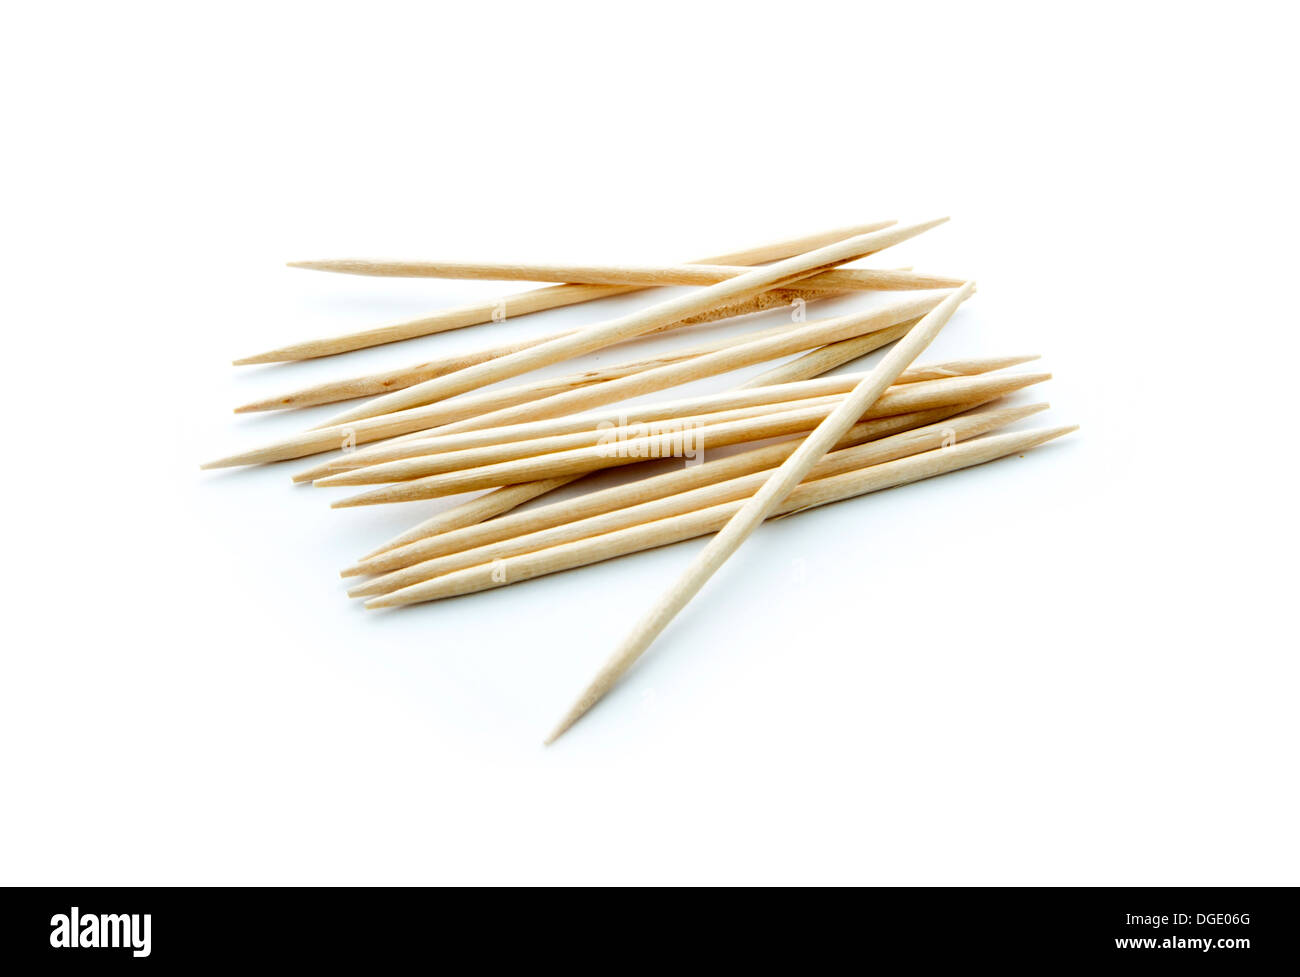 group of toothpicks isolated on white background - Stock Image